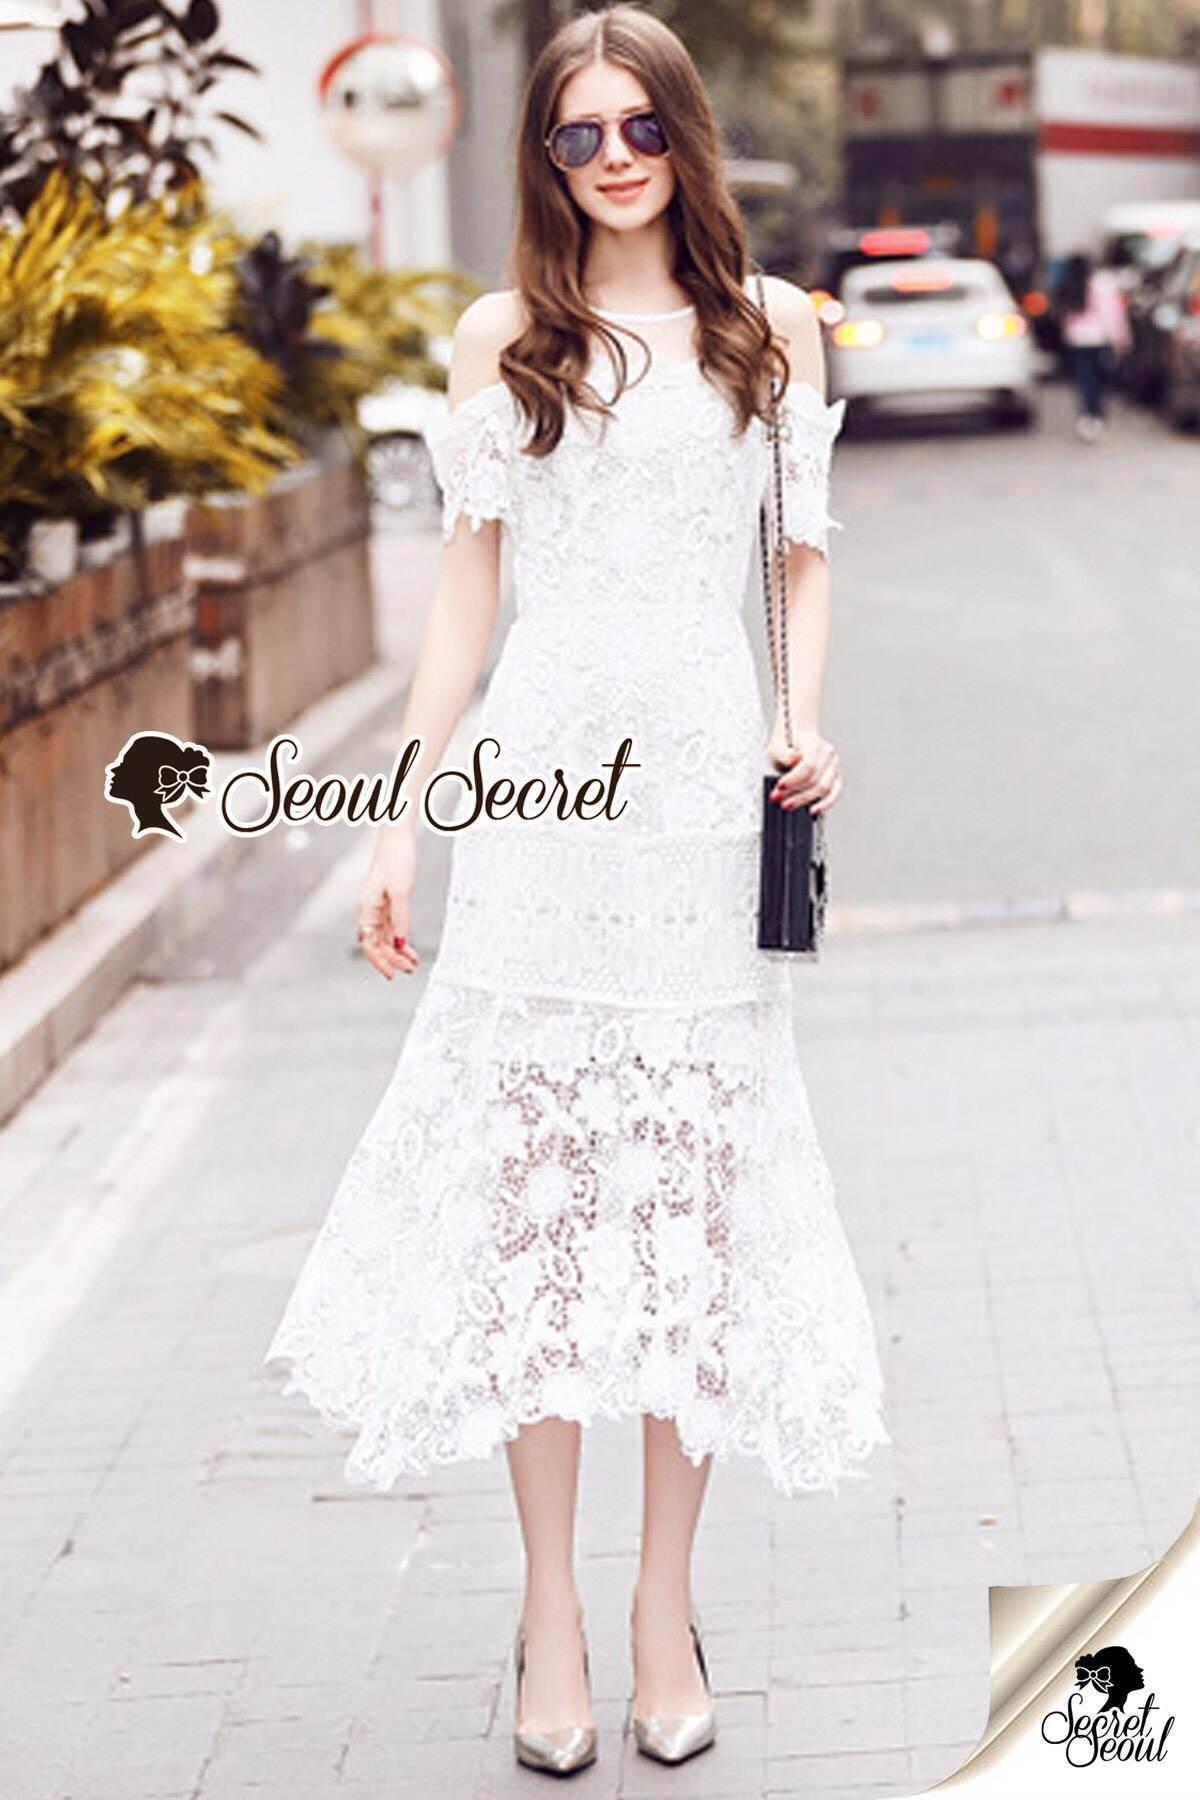 Seoul Secret Say's... Princess Daisy Curlv Lace MaxiDress